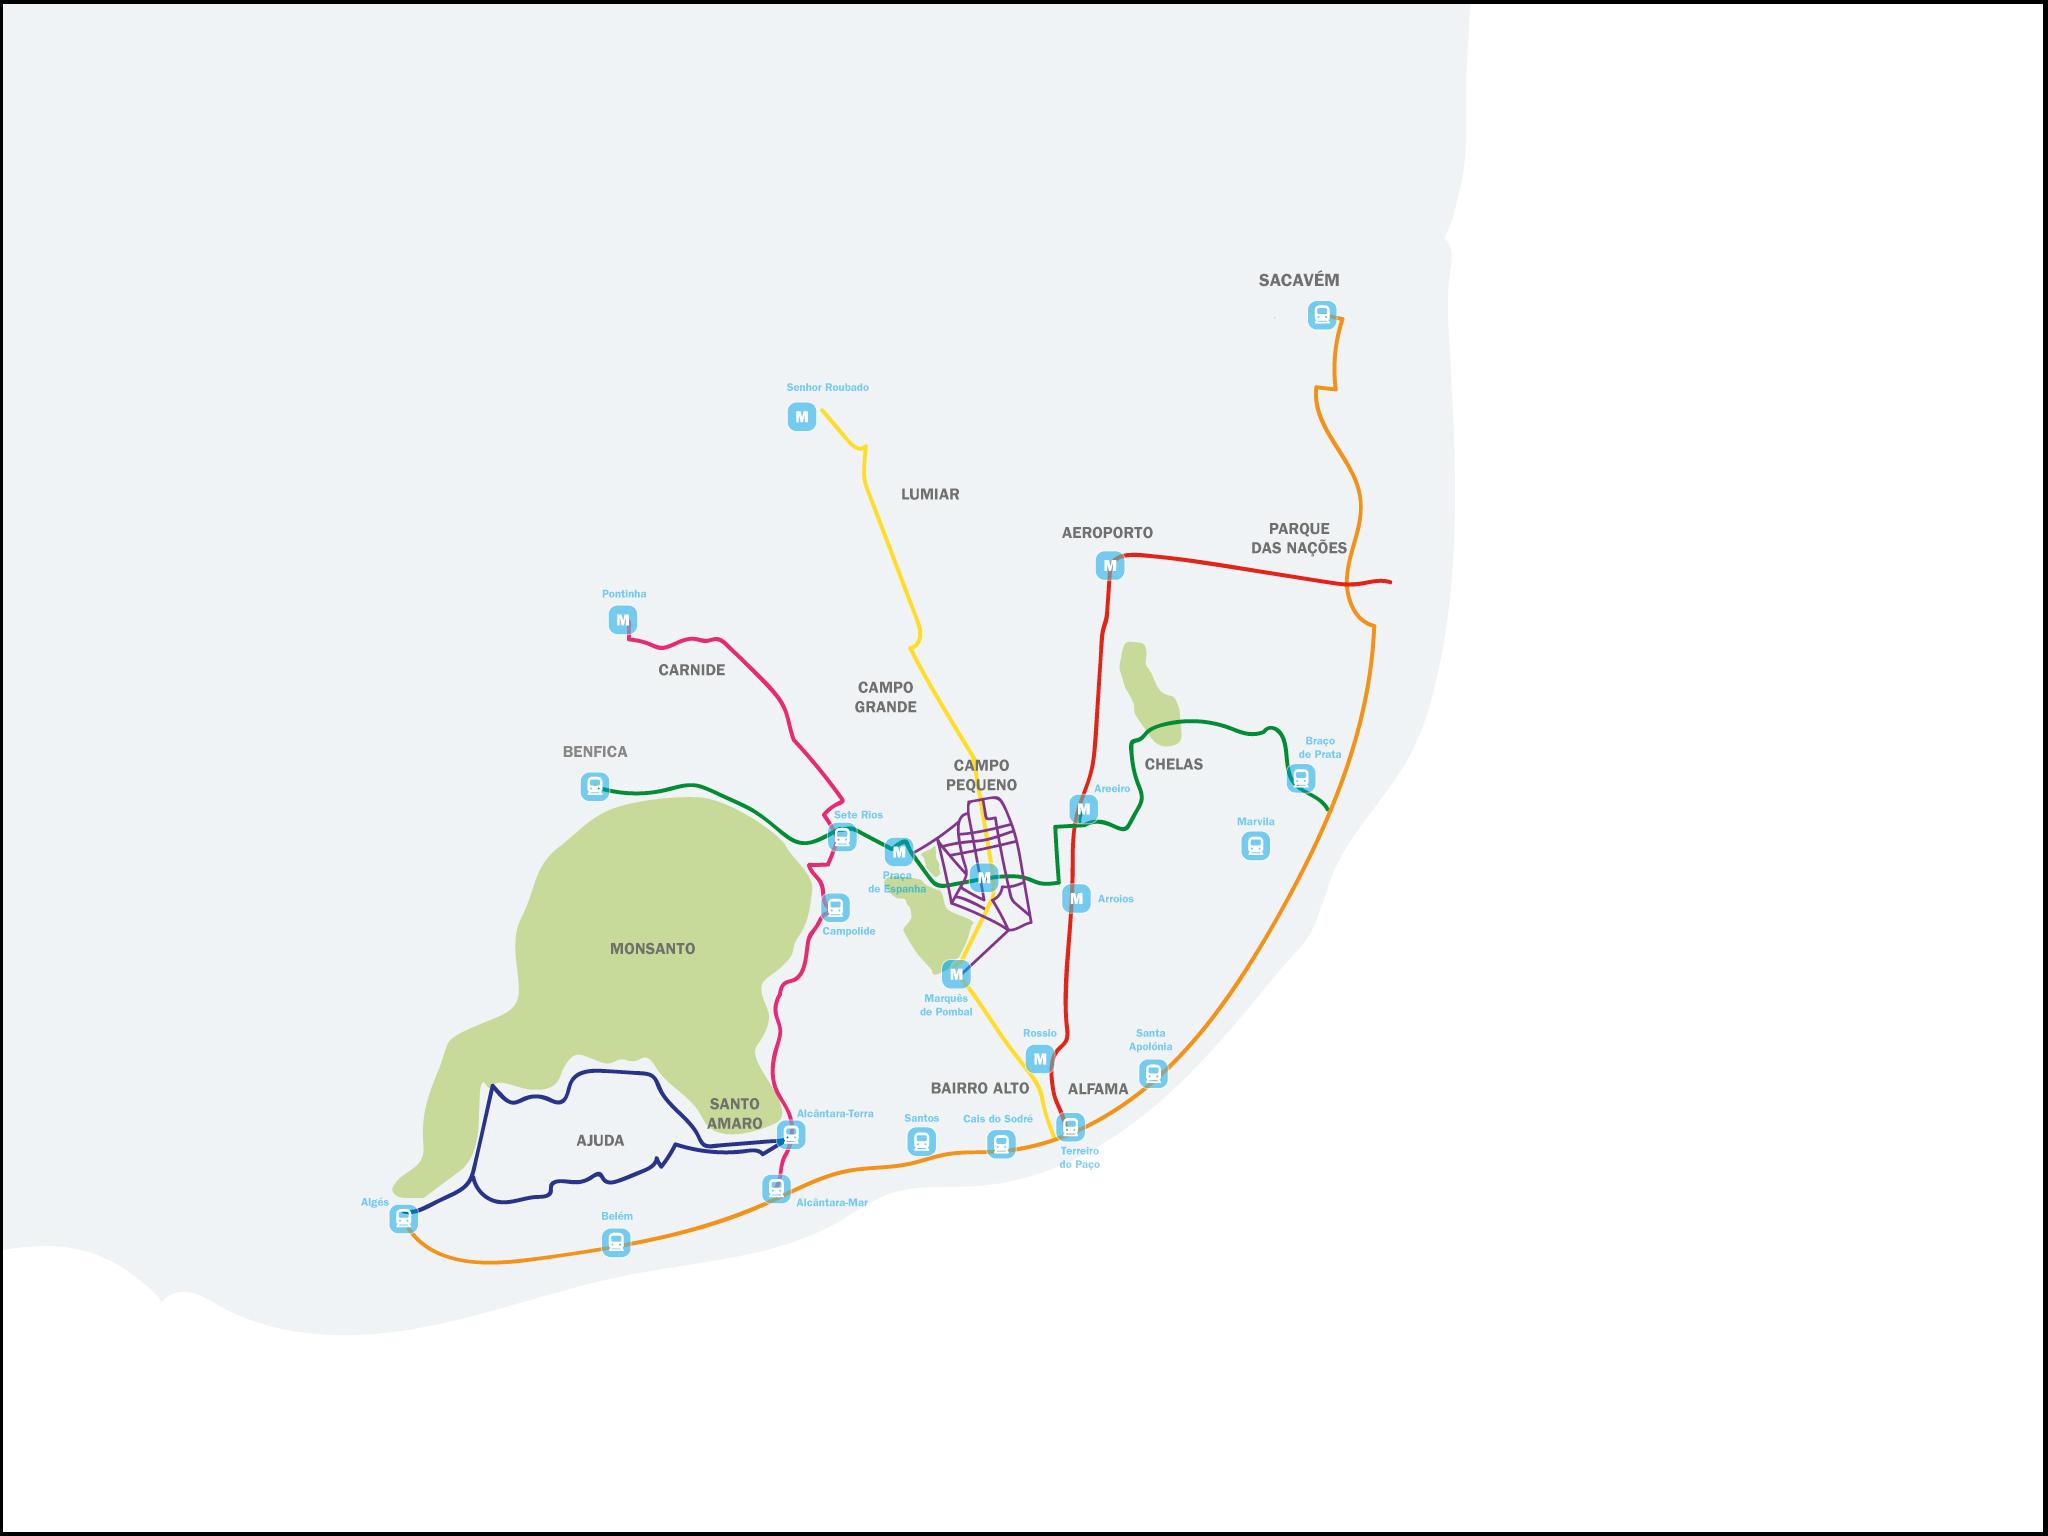 Lisboa vai ter 200 quilómetros de ciclovia